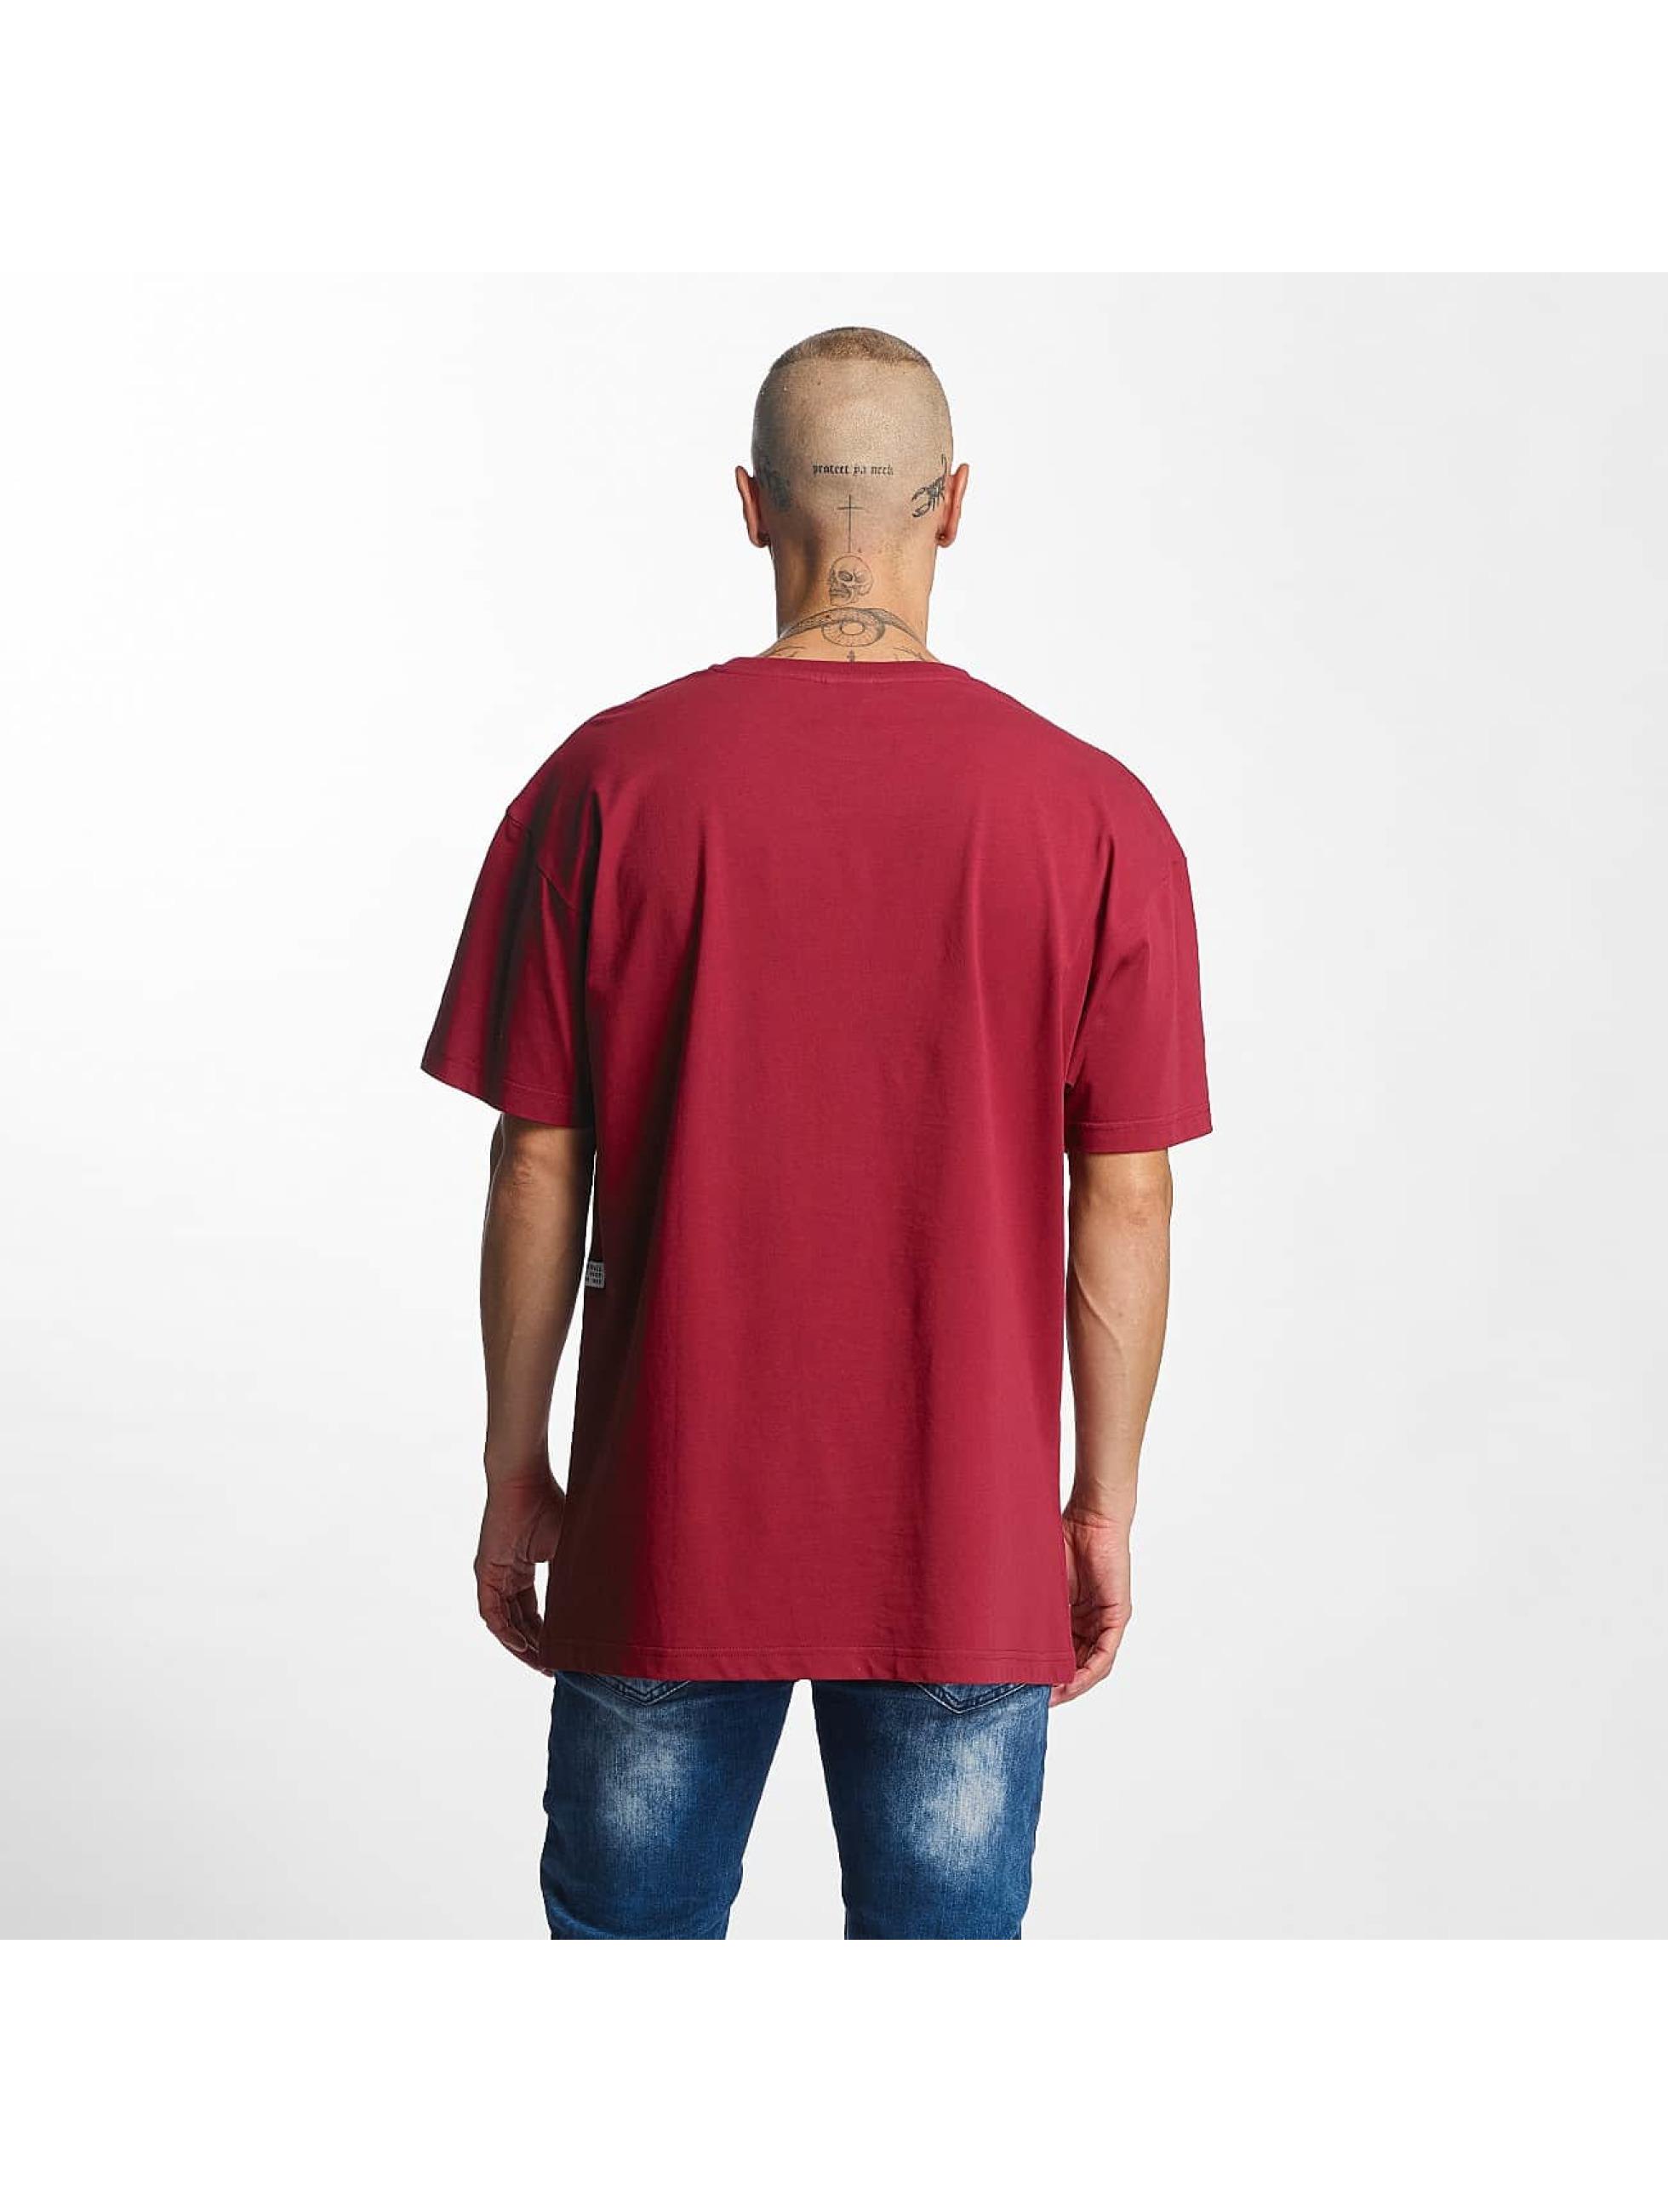 K1X T-Shirt Play Hard Basketball red